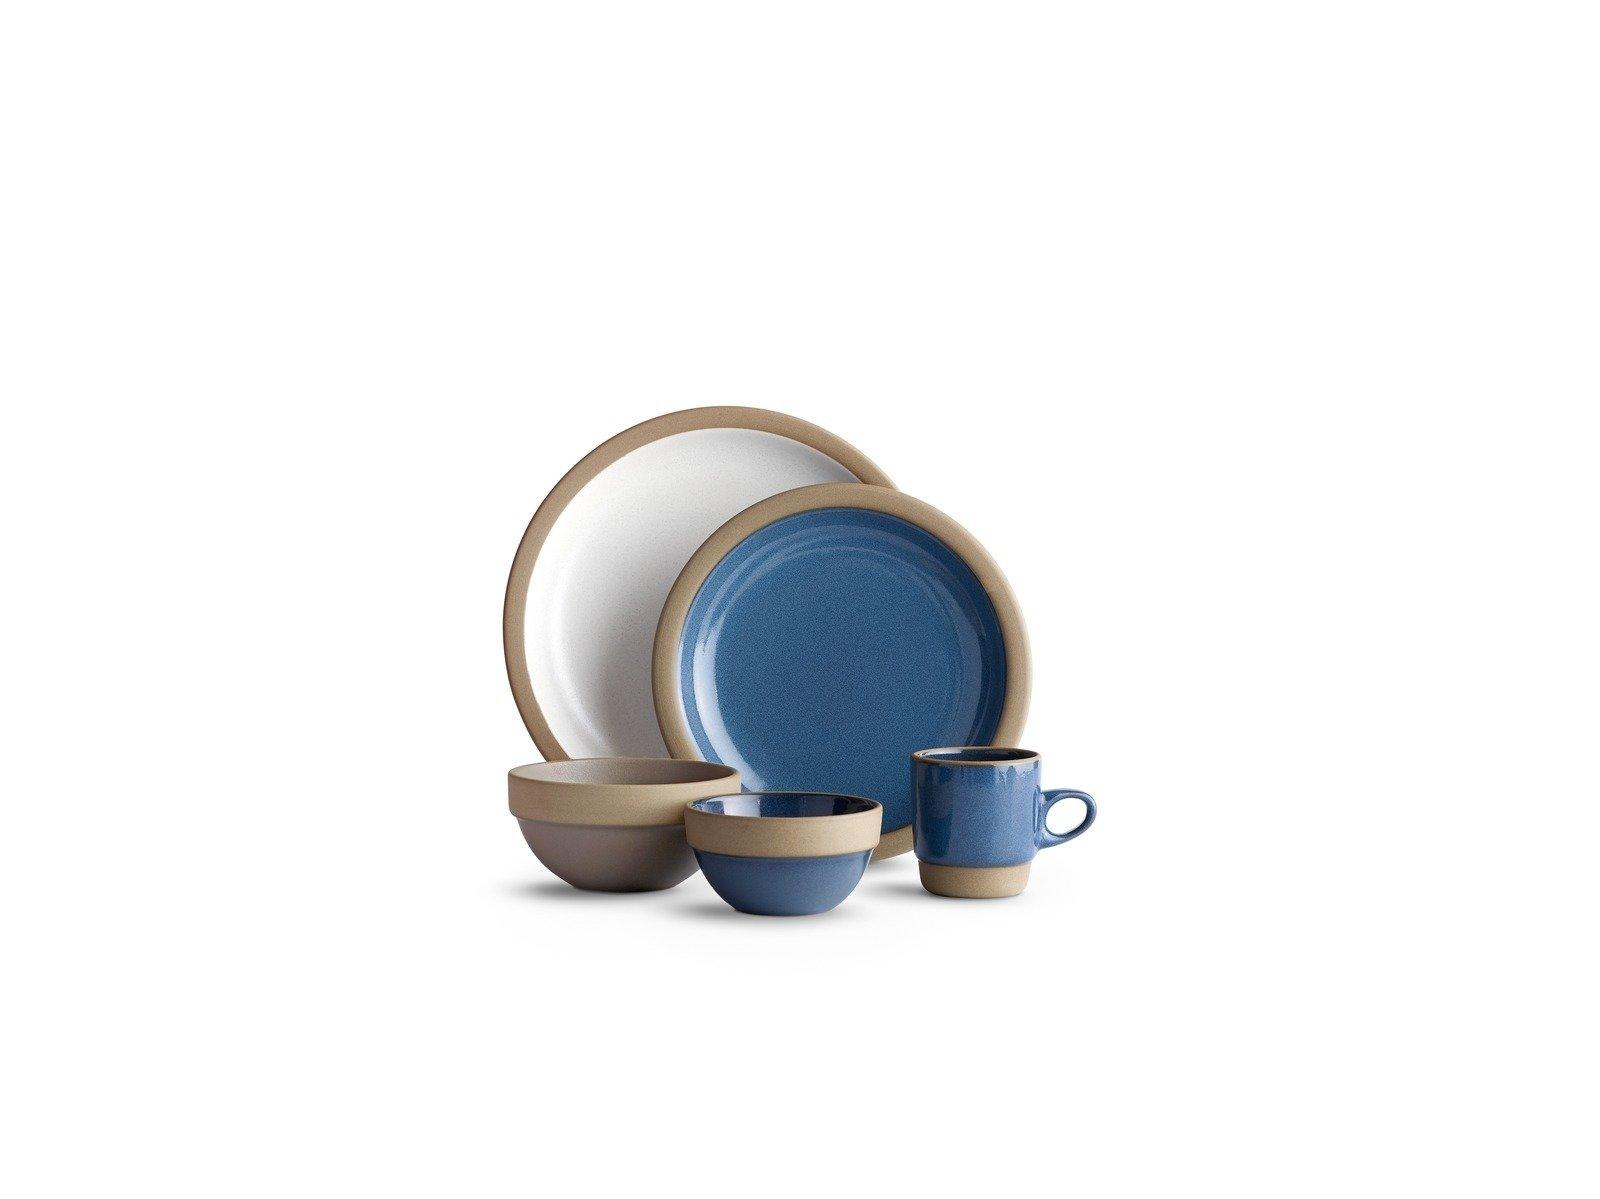 Heath Ceramics Full Dinnerware Set by Heath Ceramics - Dwell